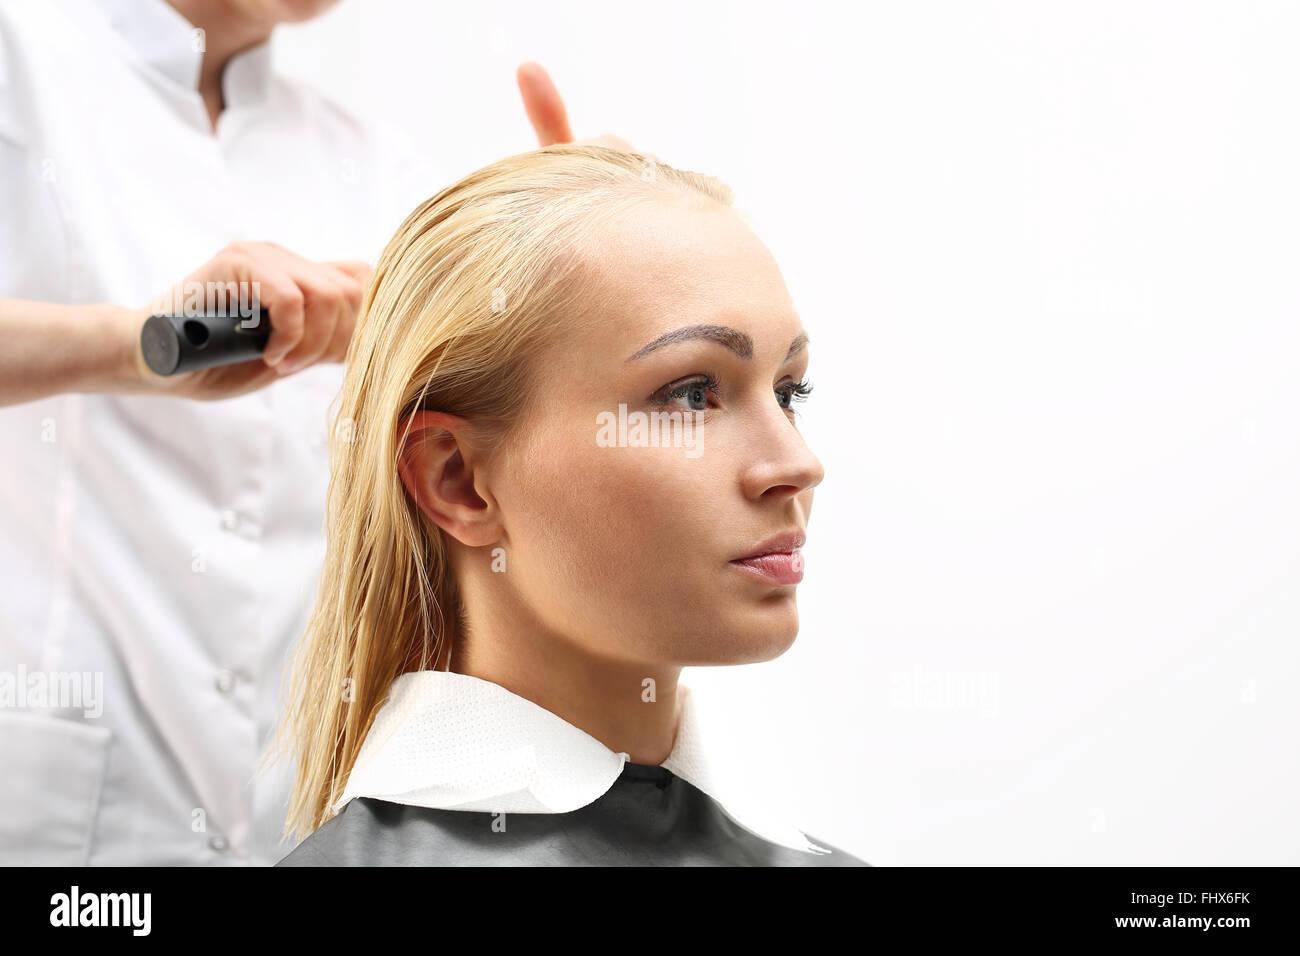 Mittellange Haare Die Frau Beim Friseur Haare Zu Kämmen Die Frau